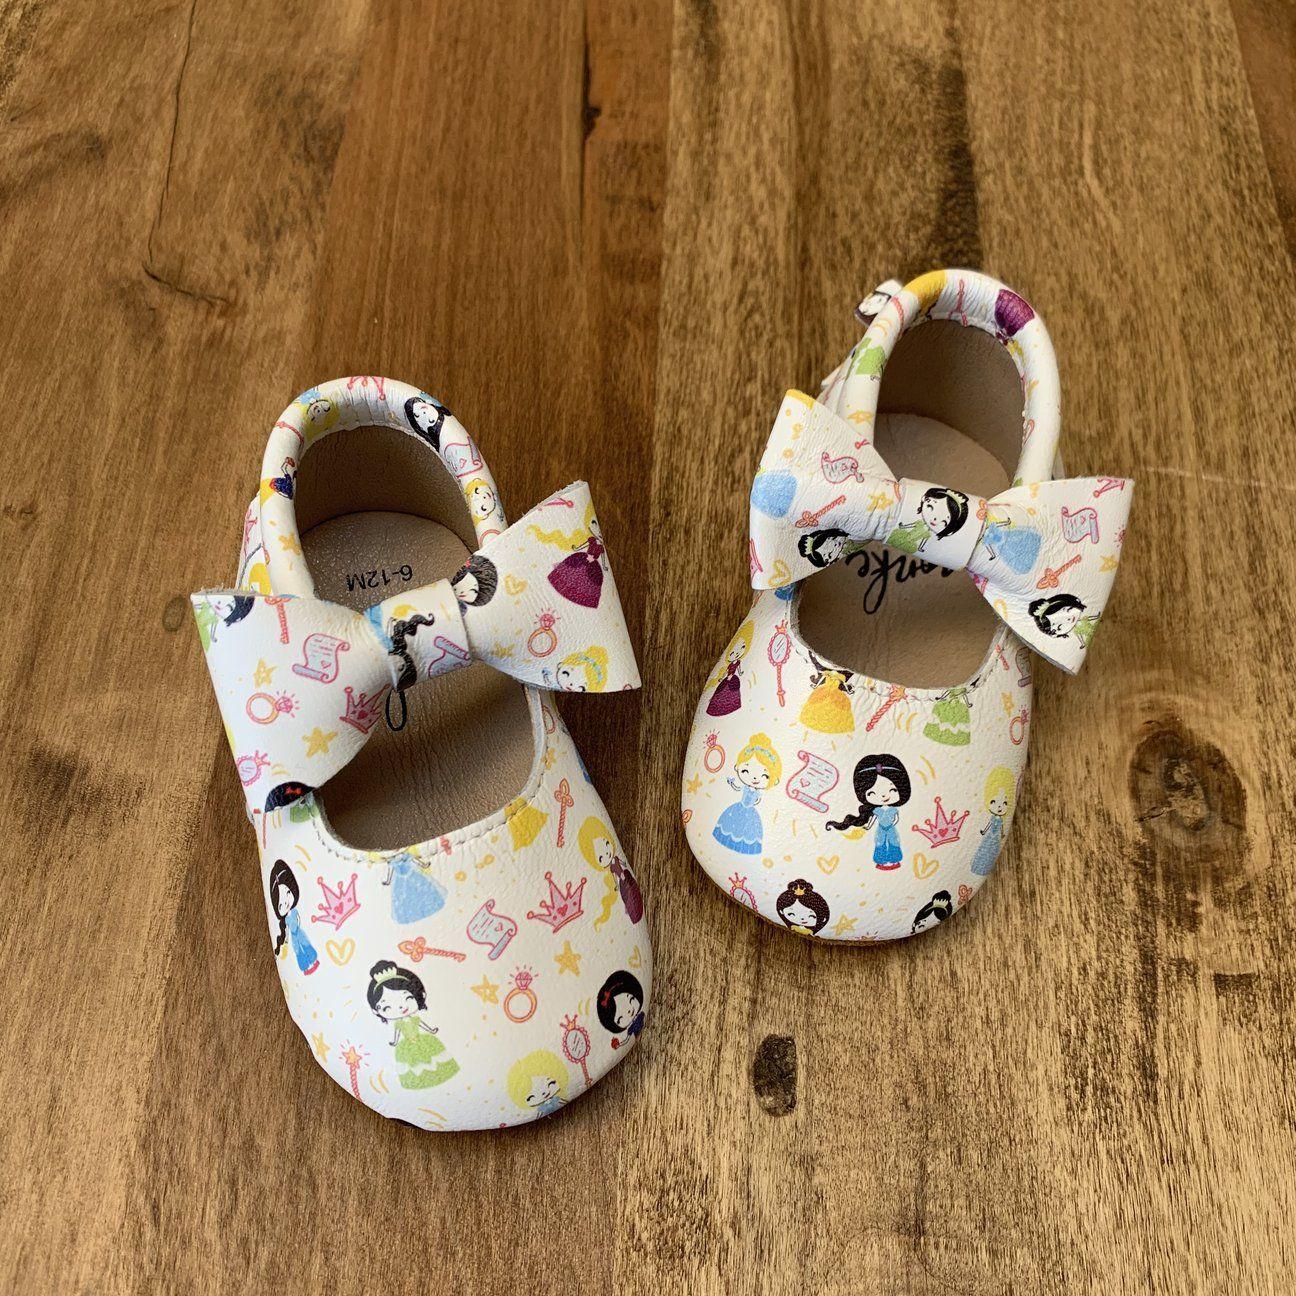 Randolly Toddler Shoes Summer Infant Kids Baby Girls Elegant/ Flower/Hallow Sandals Princess Shoes